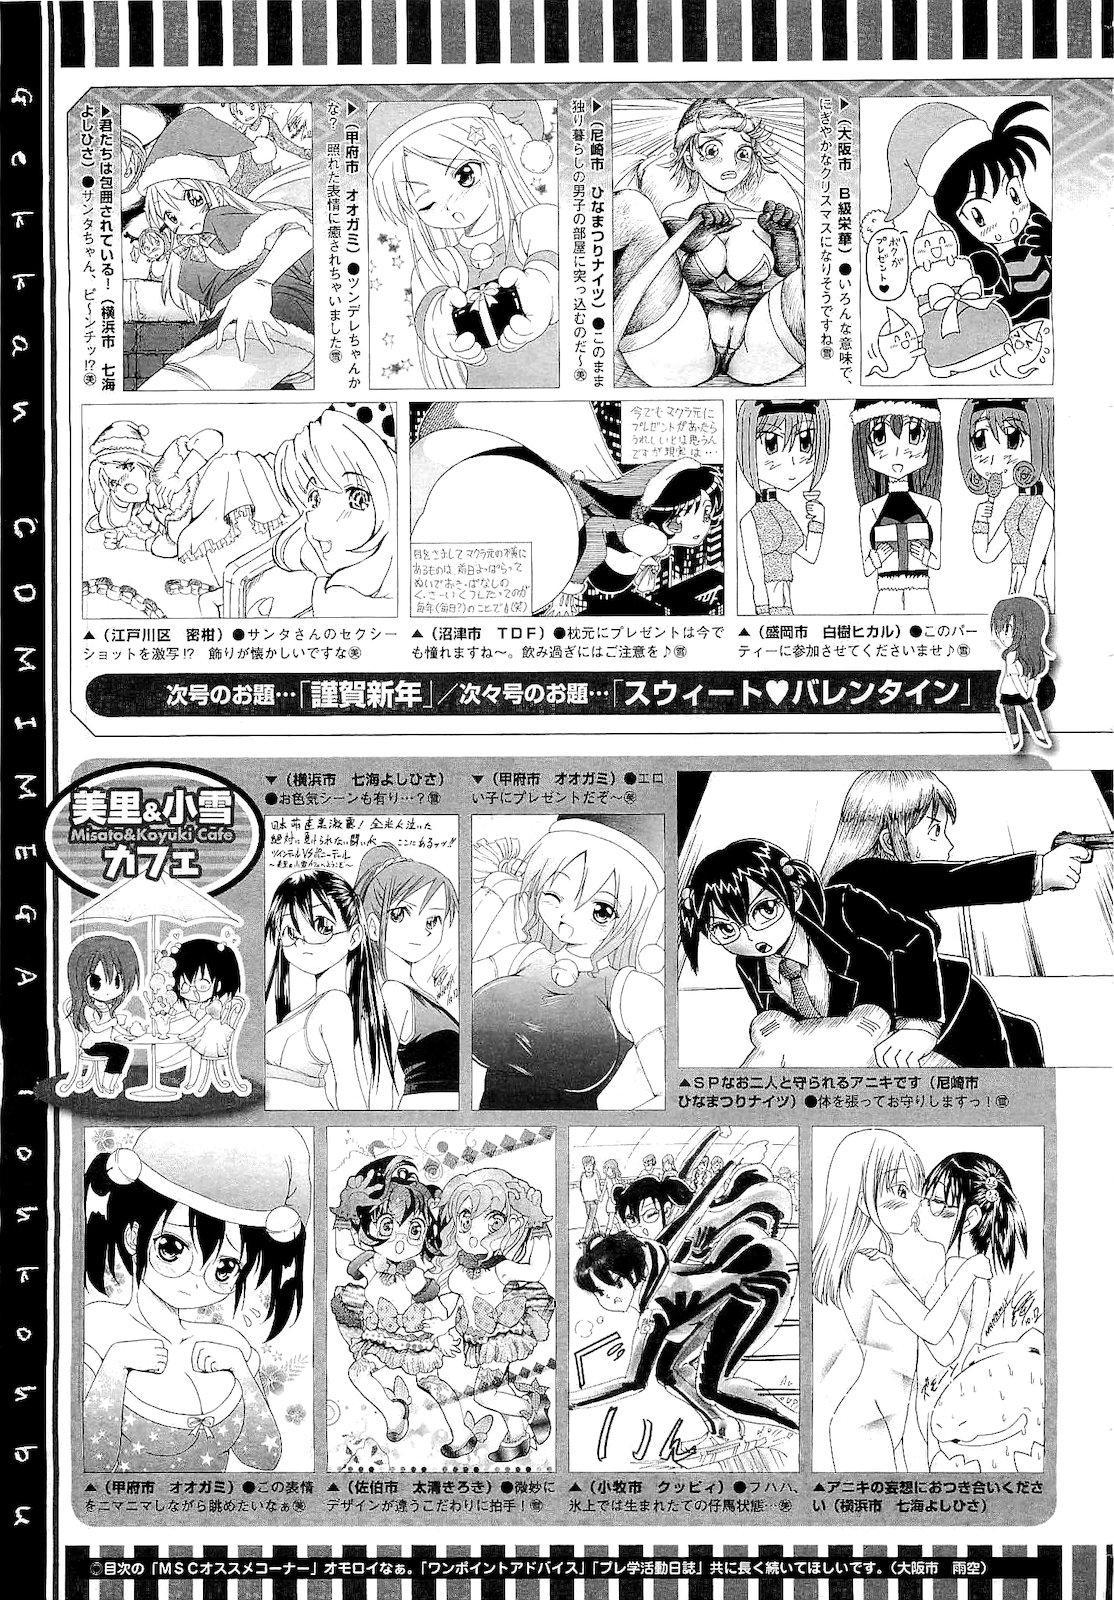 COMIC Megastore 2011-02 522